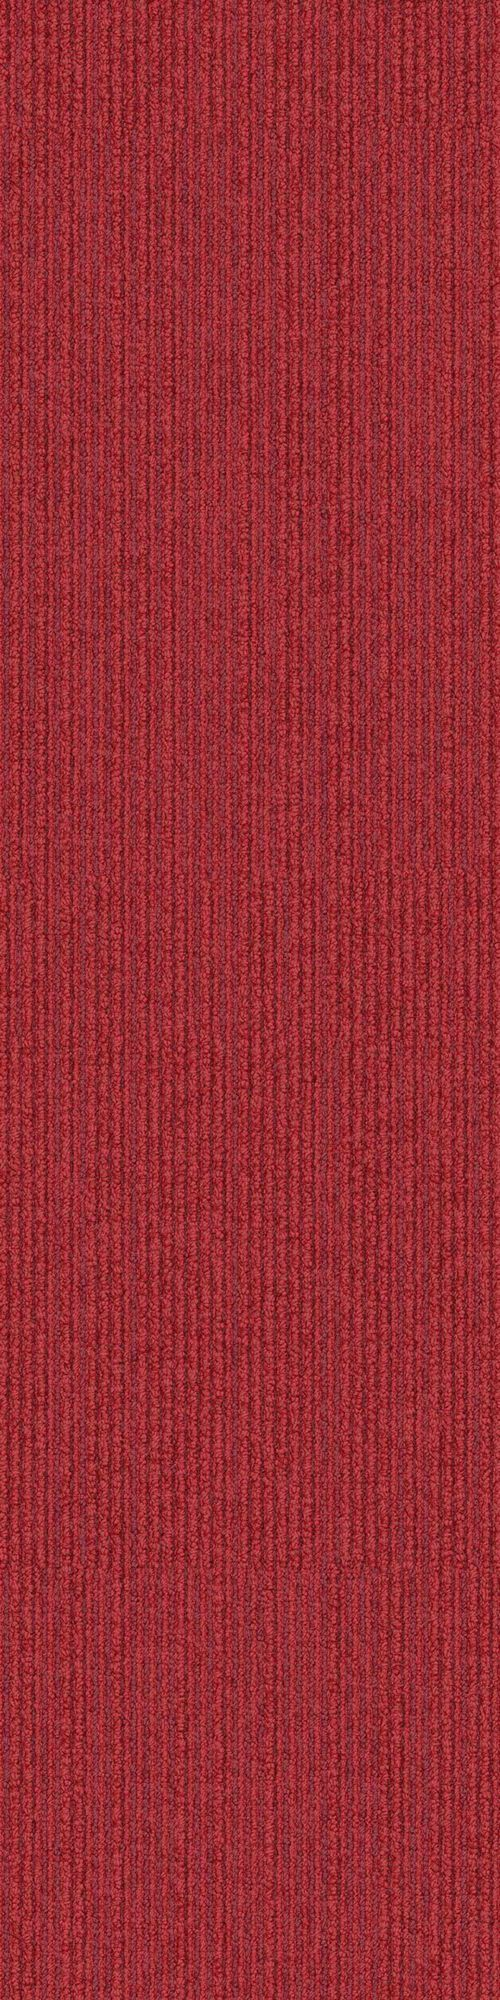 Interface carpet tile: On Line Color name: Pewter Variant 6